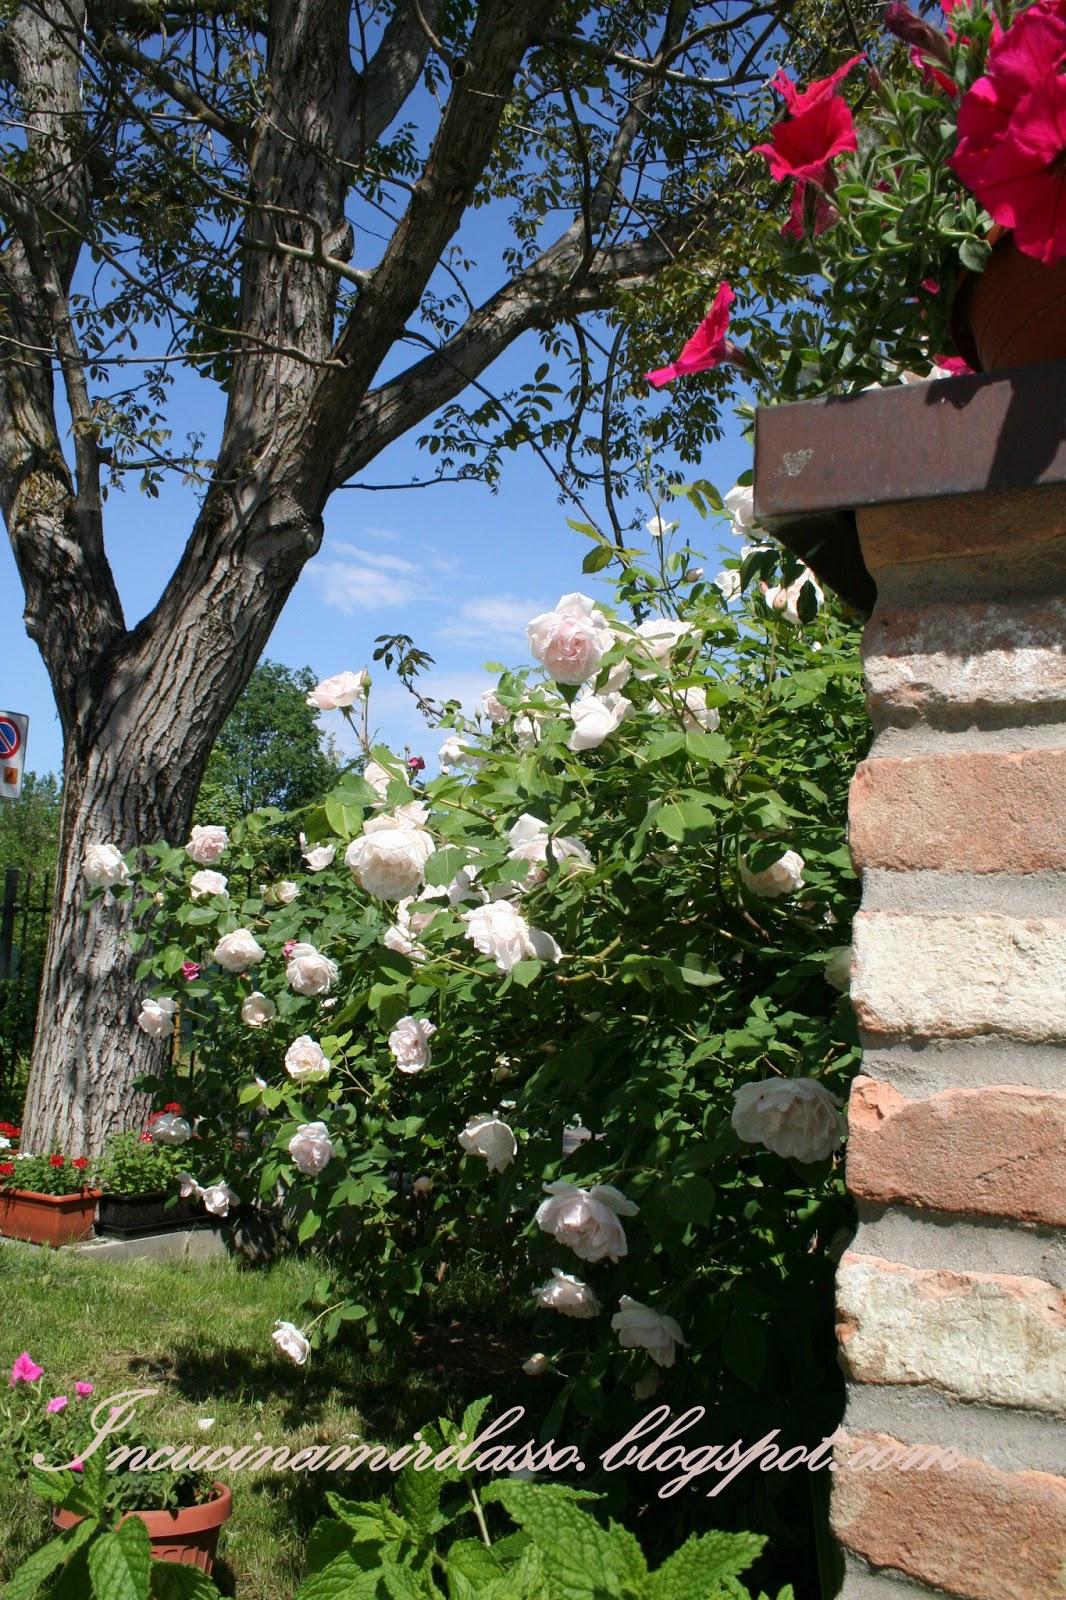 In cucina mi rilasso sbocciano le rose in giardino e in cucina - Rose coltivazione in giardino ...